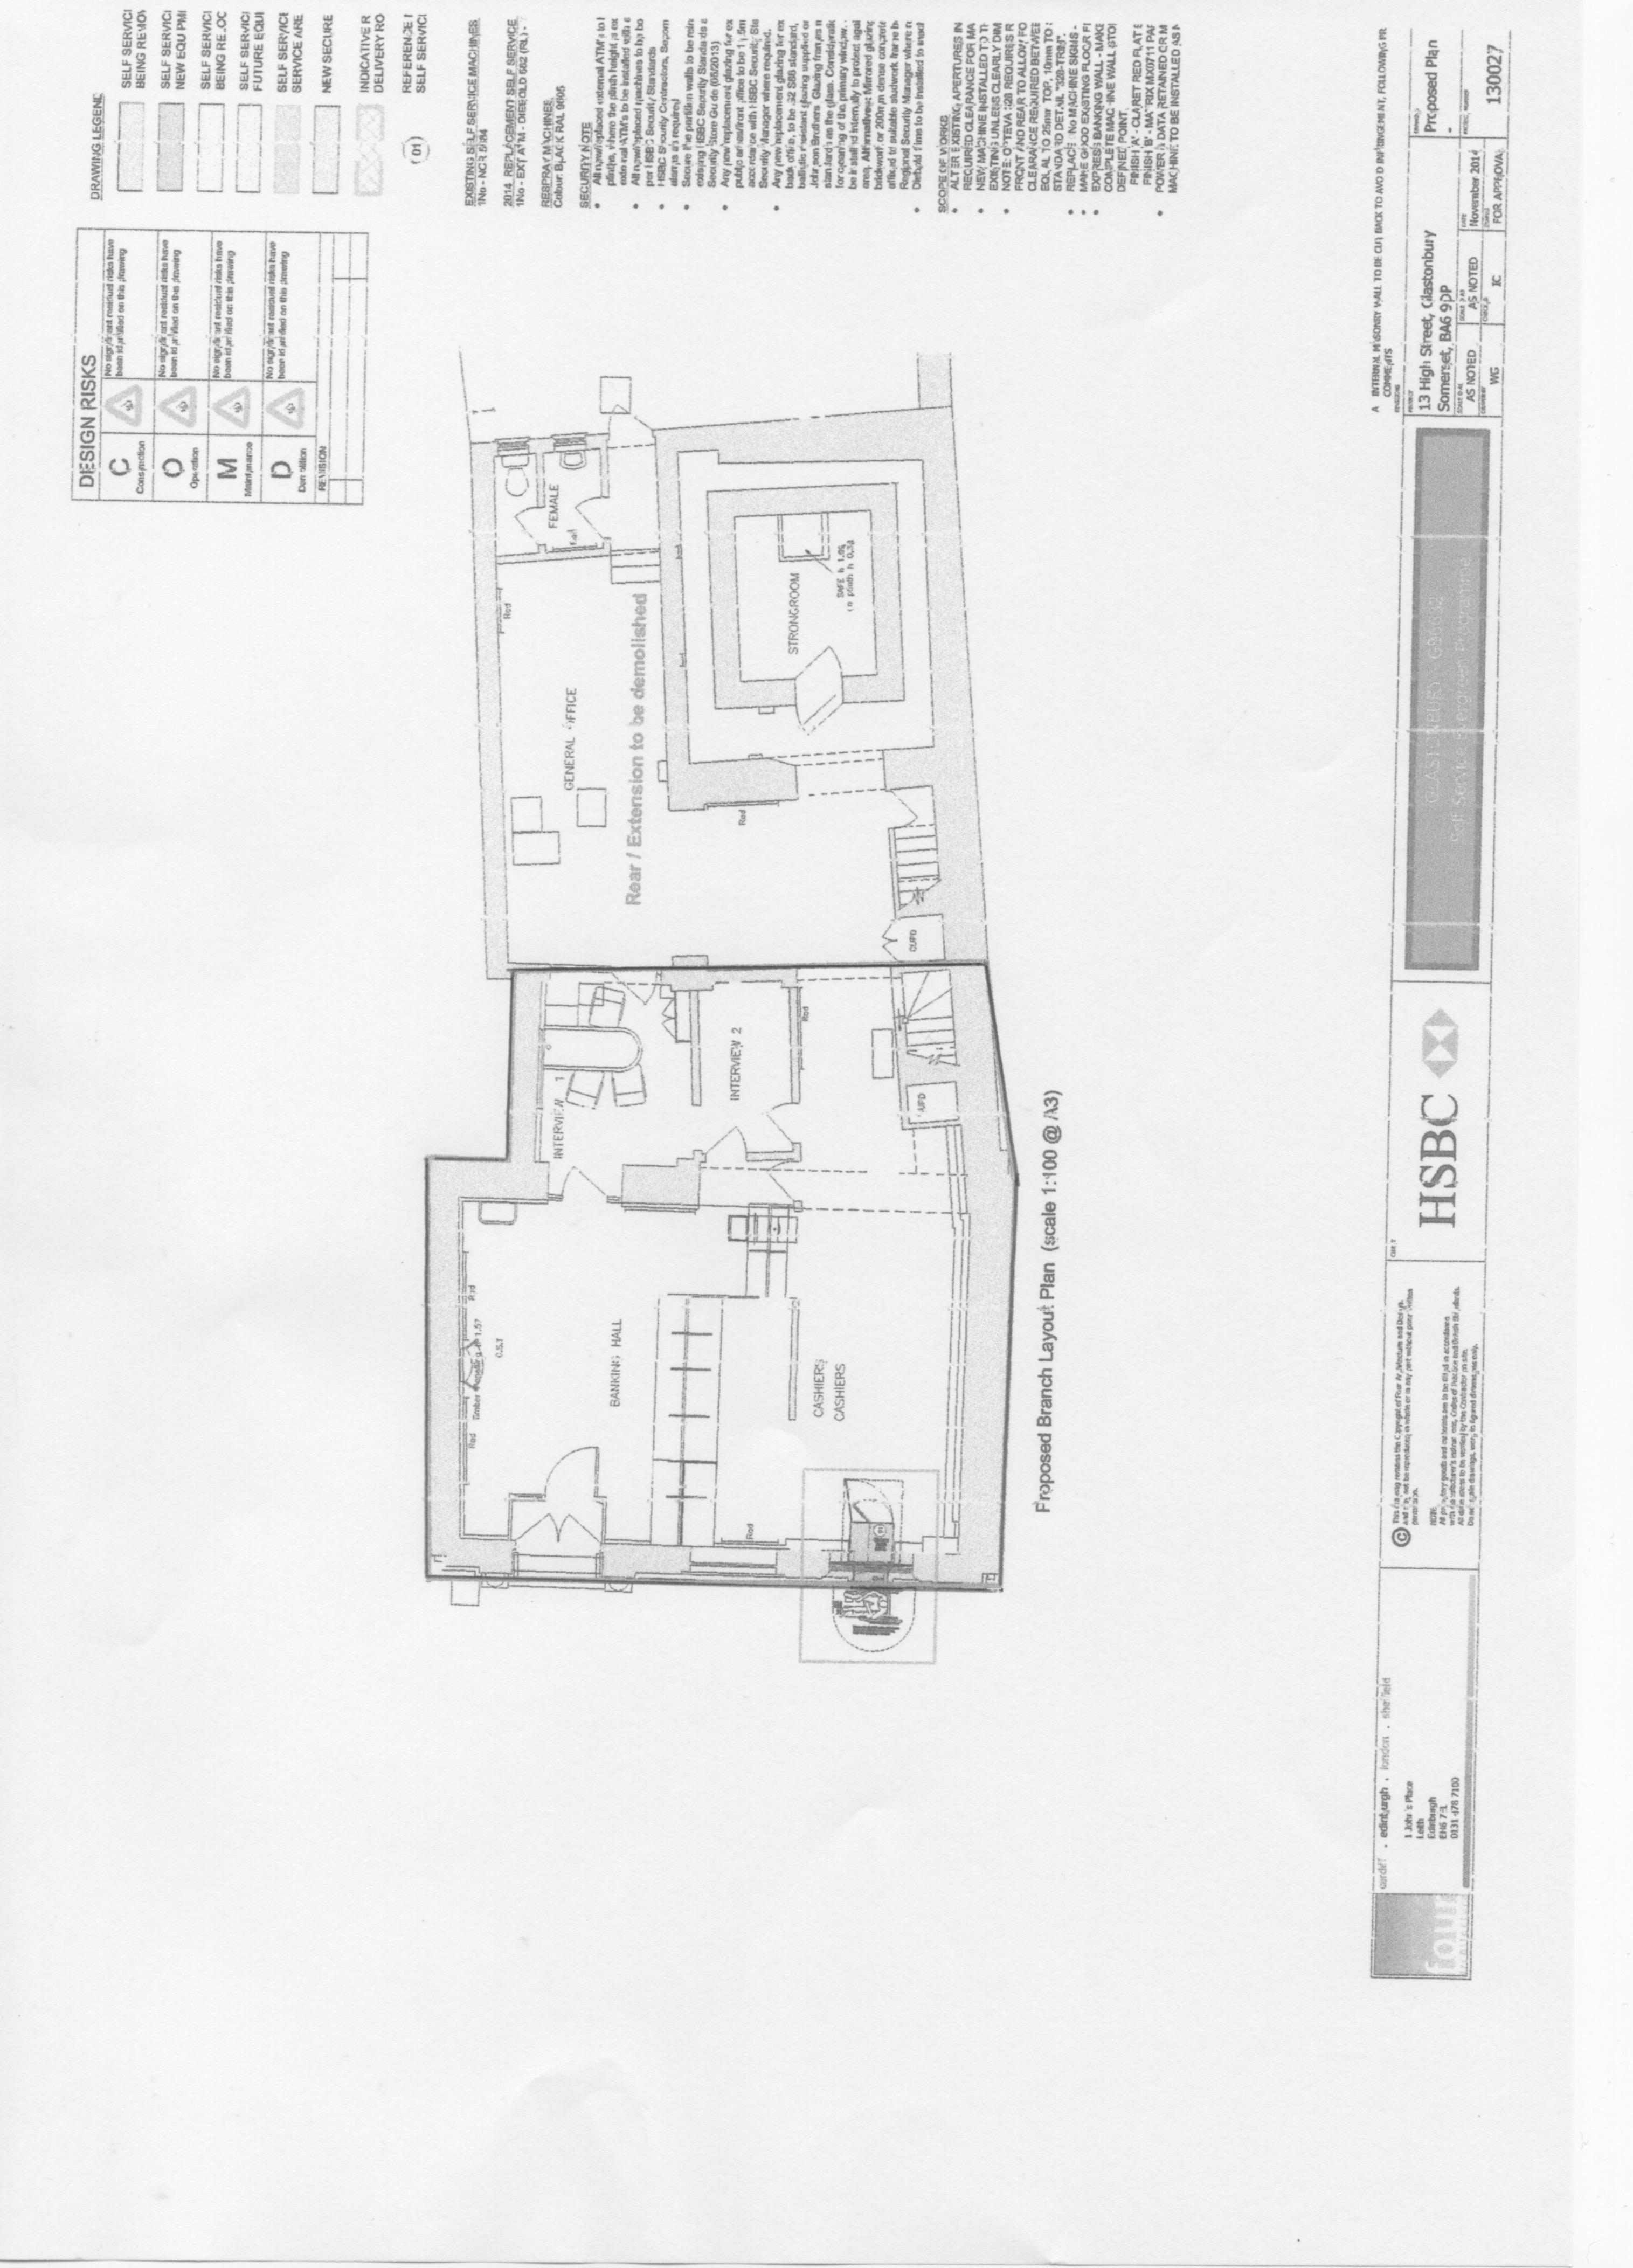 heritage estates